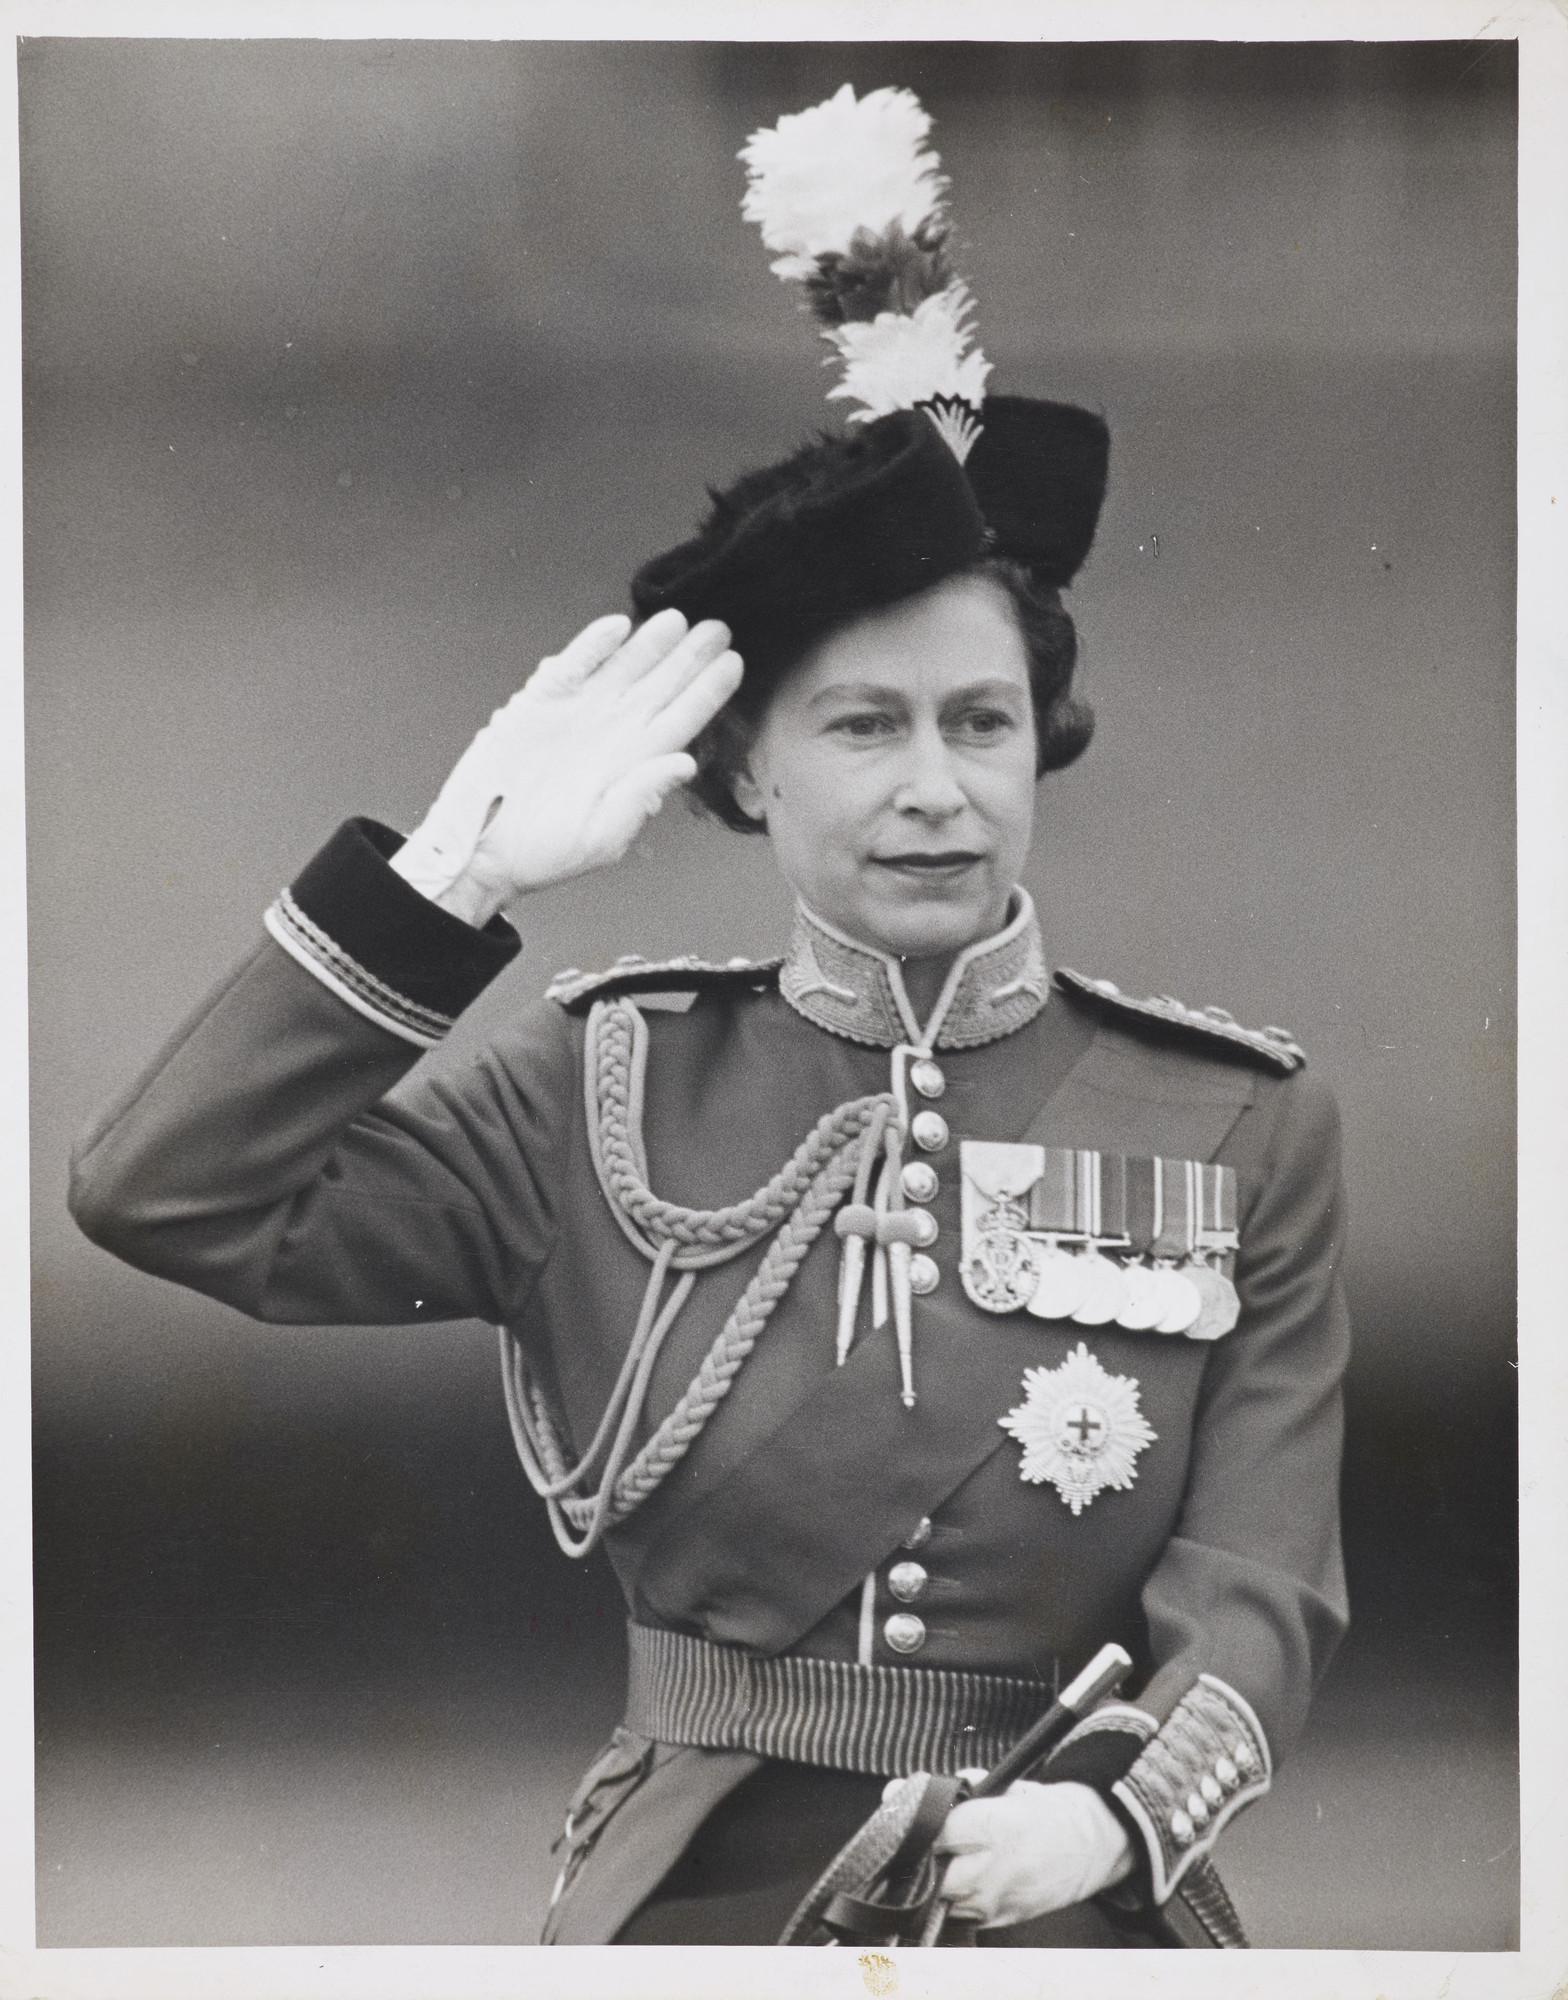 HMQ016 : HM Queen Elizabeth II - Iconic Images